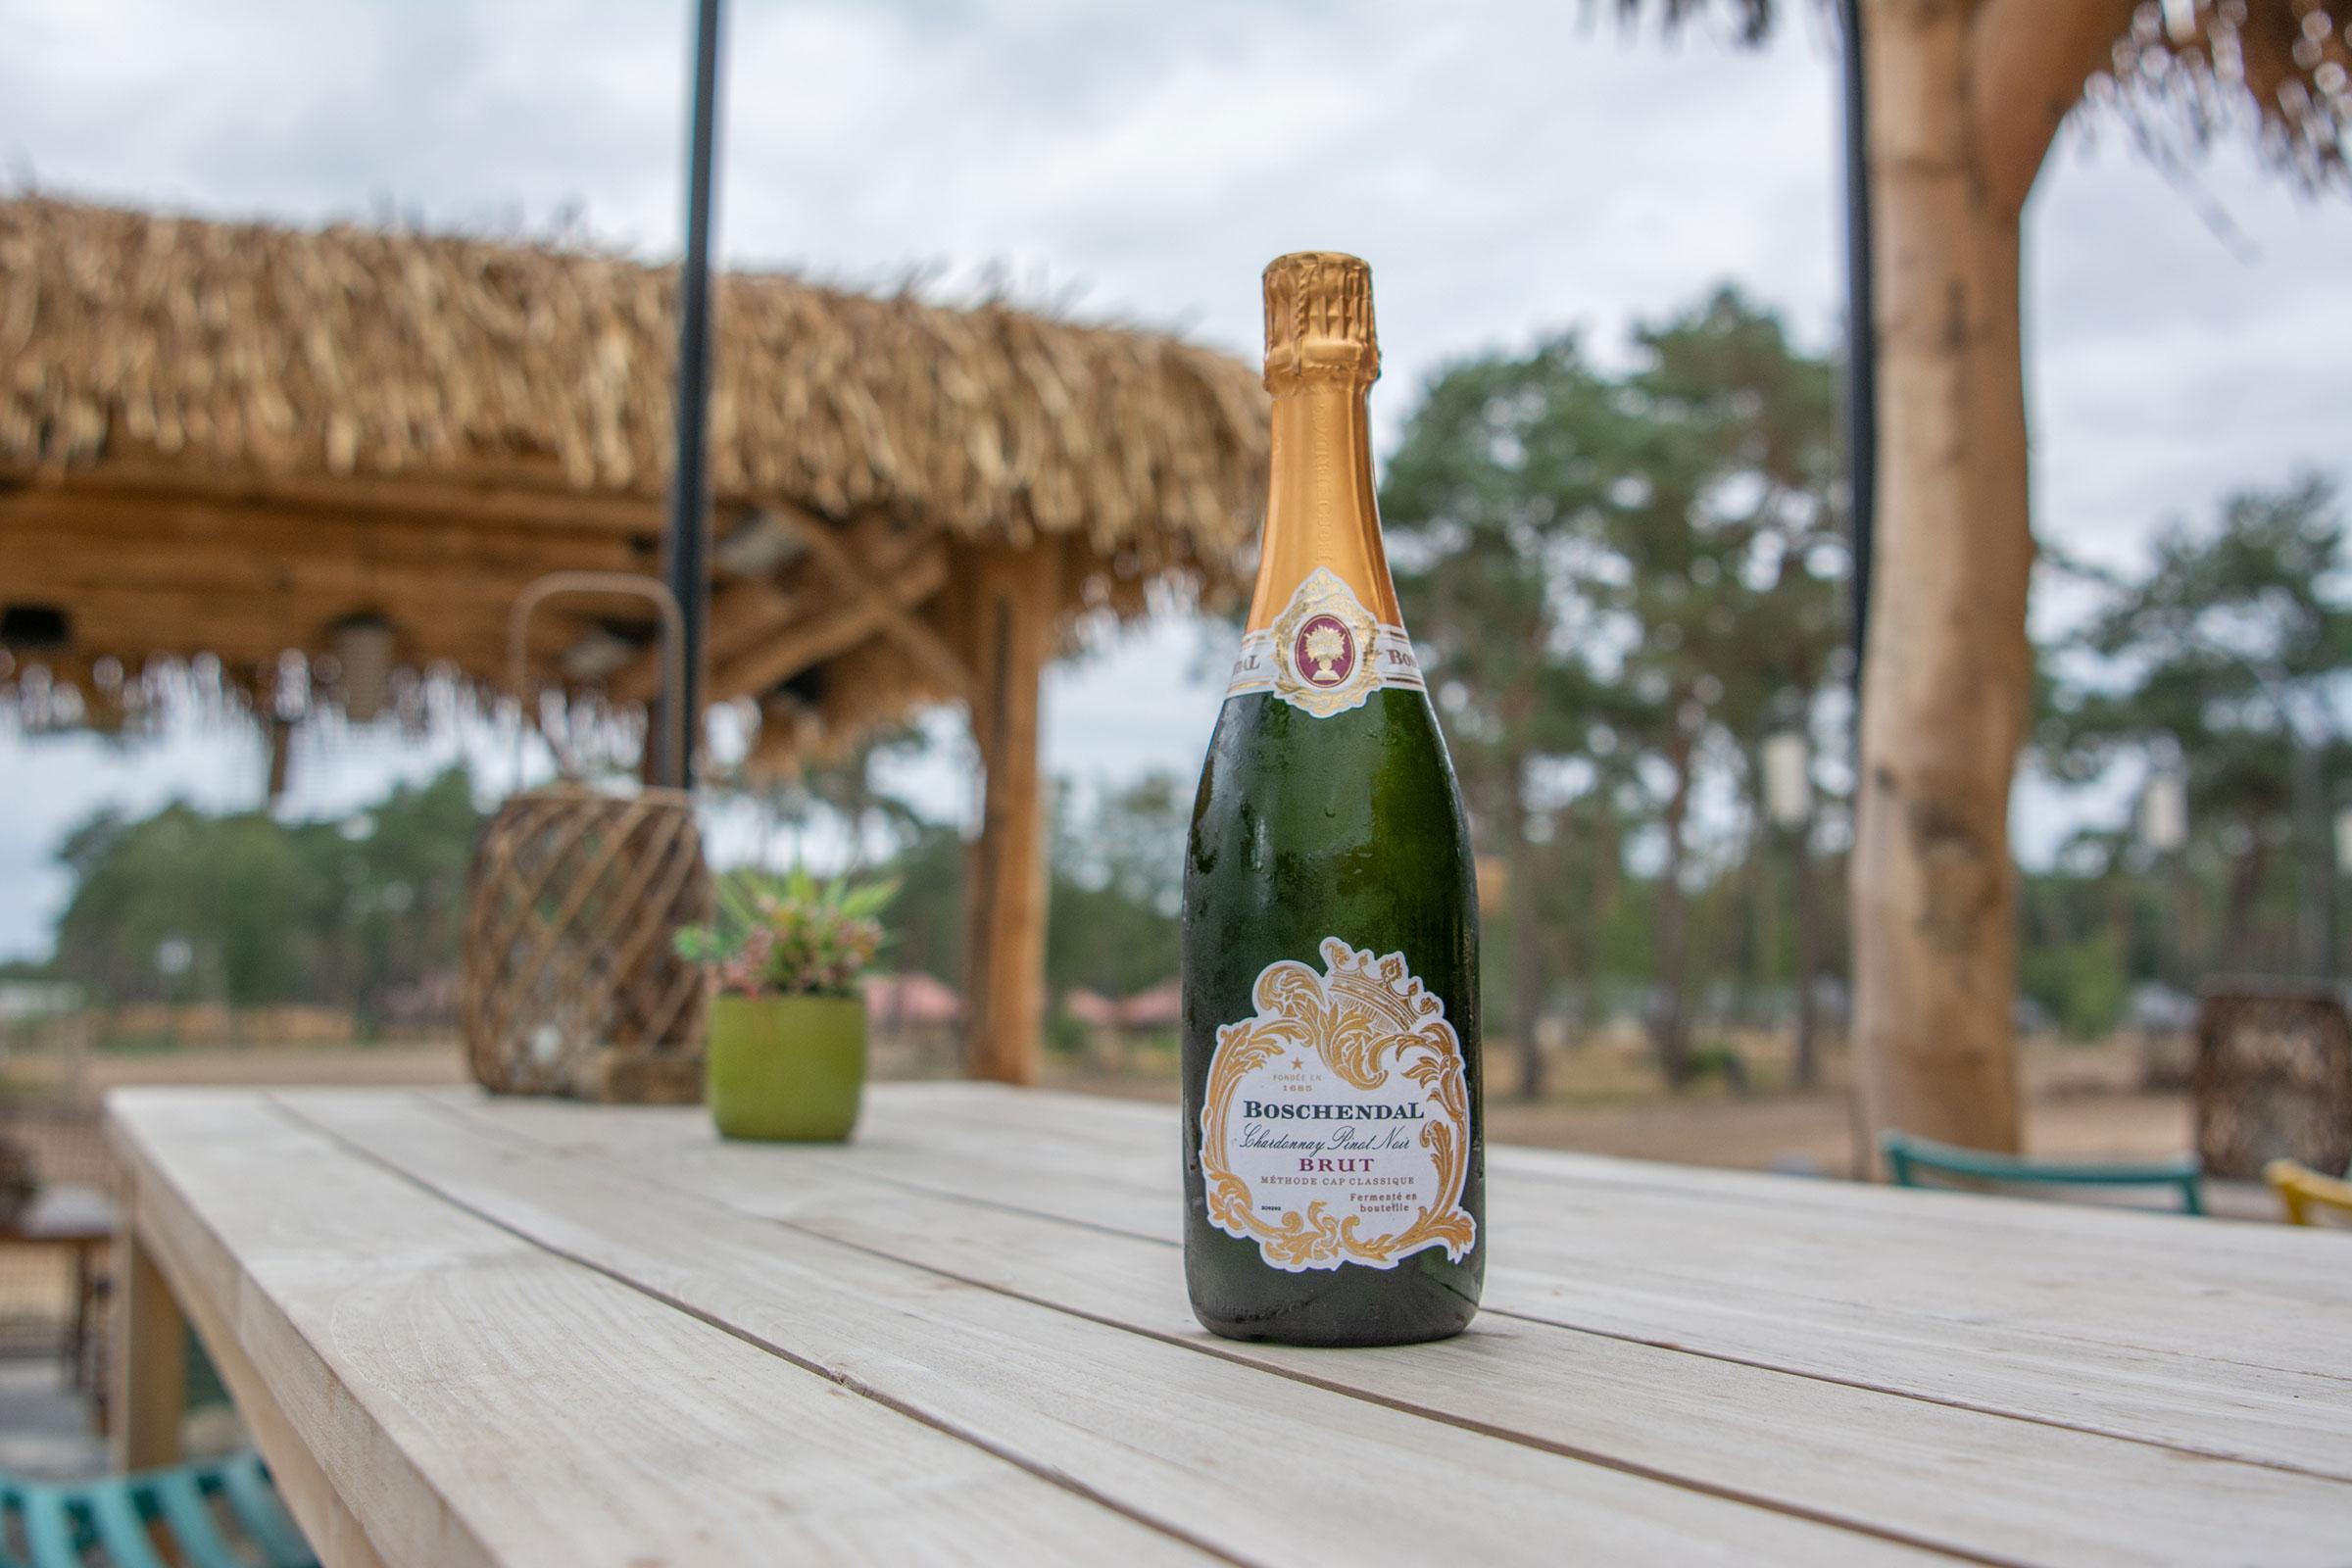 safari-resort-bij-te-boeken-champagne-bubbels-fles.jpg